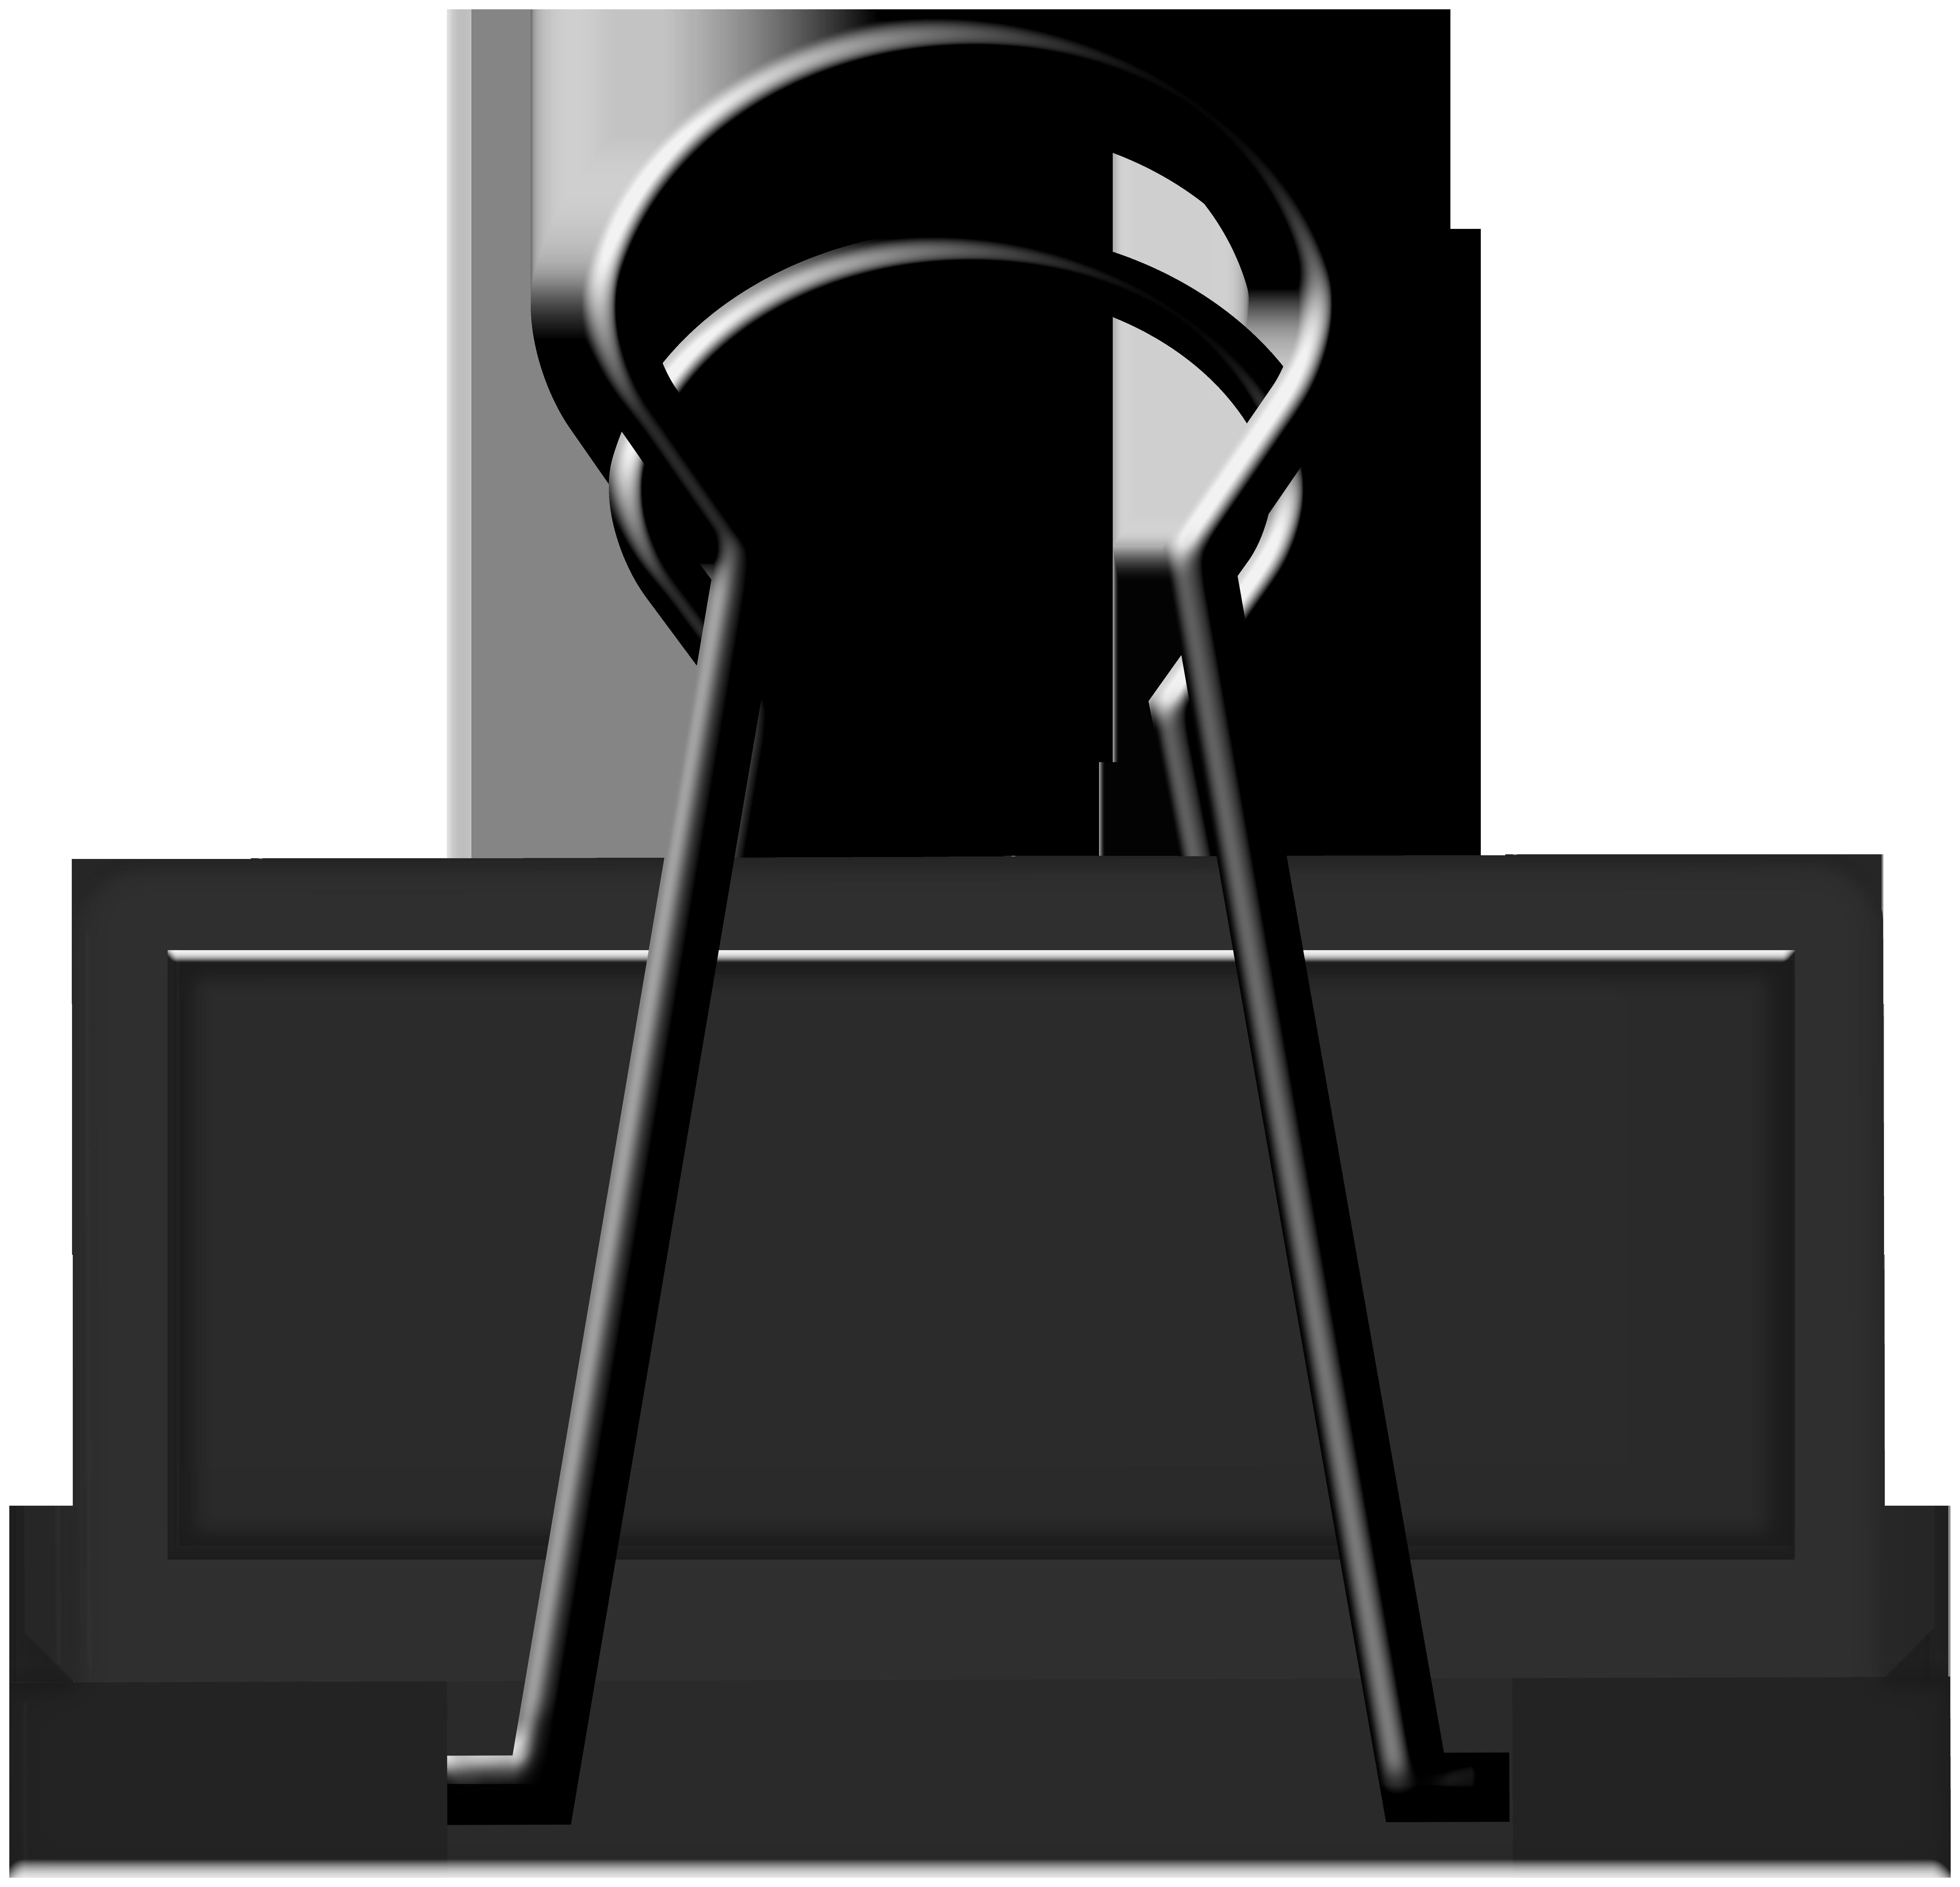 Black Binder Clip Art.